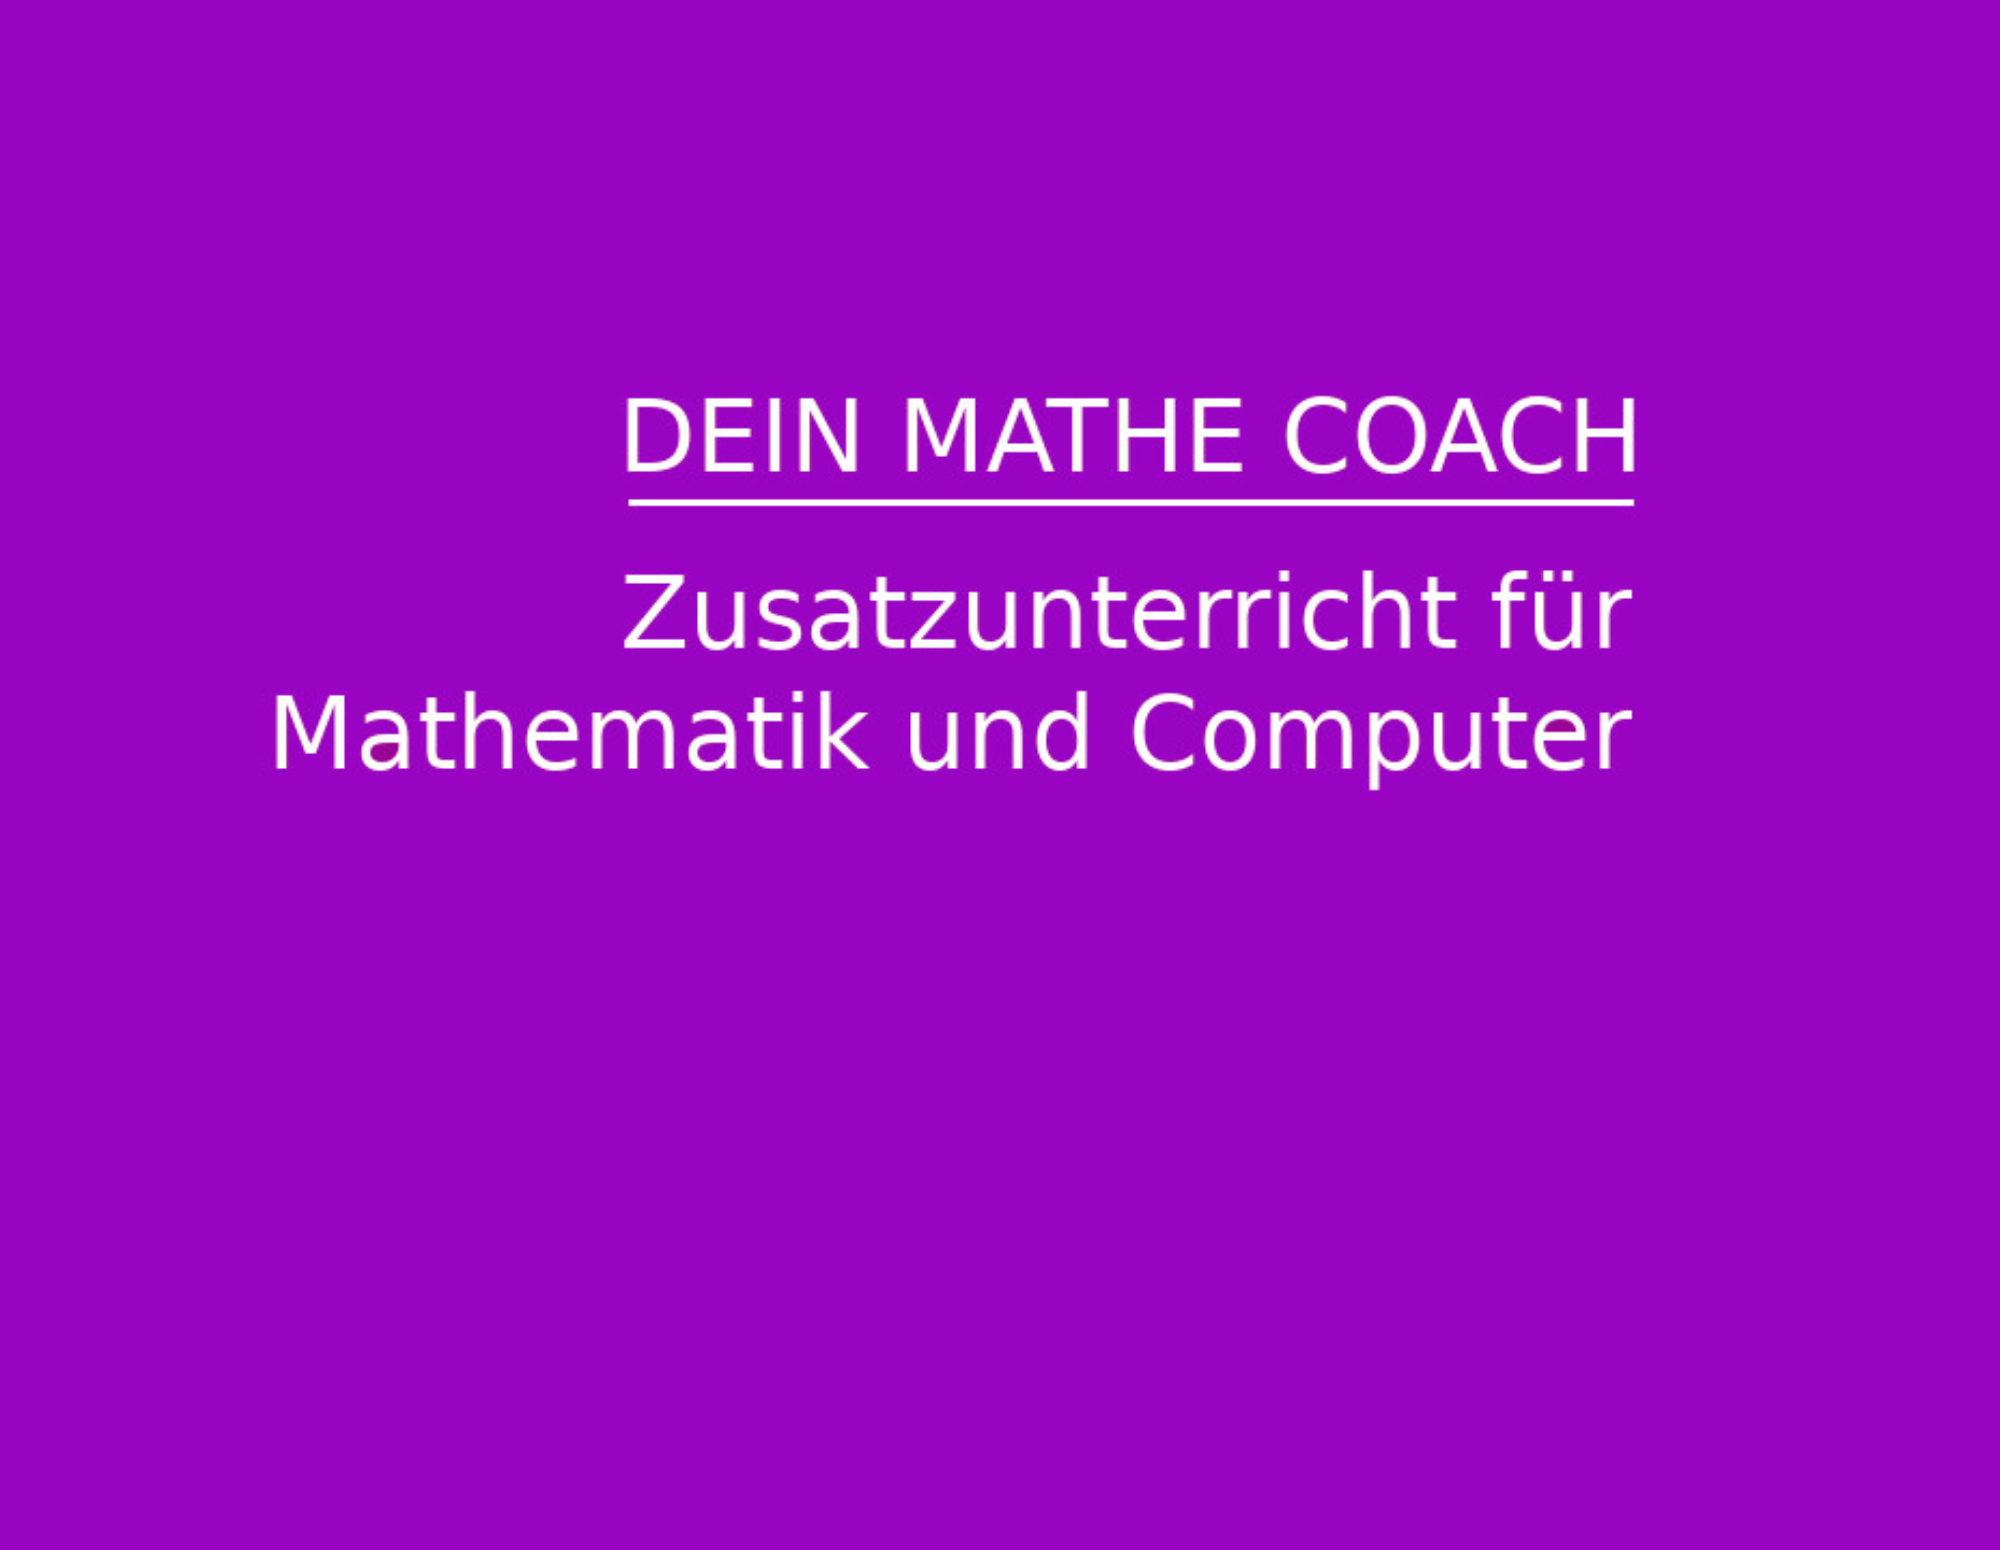 Mathe Coach